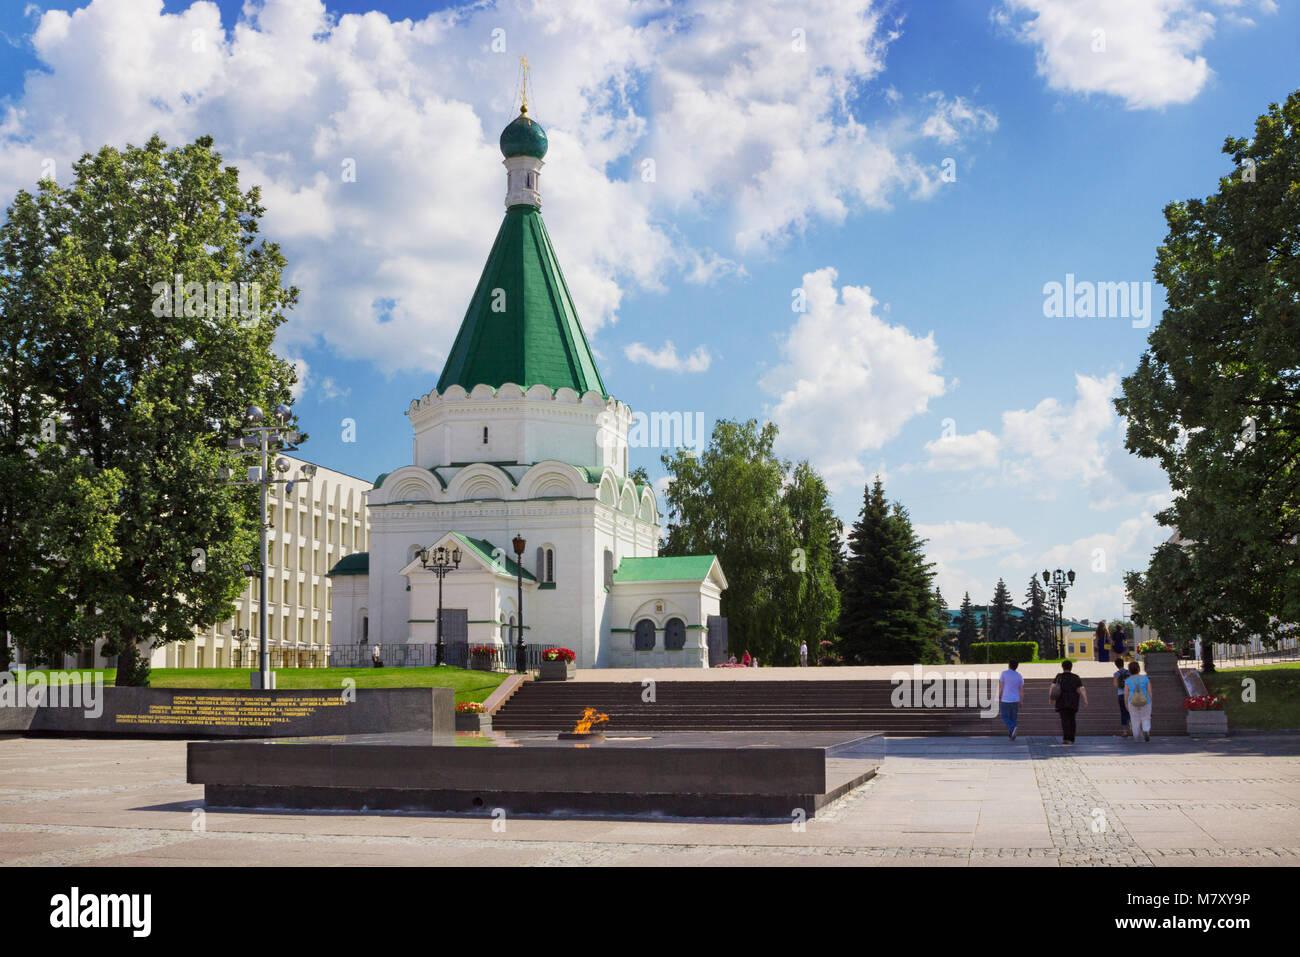 In 2014, in Nizhny Novgorod roads will invest twice as much finance 9